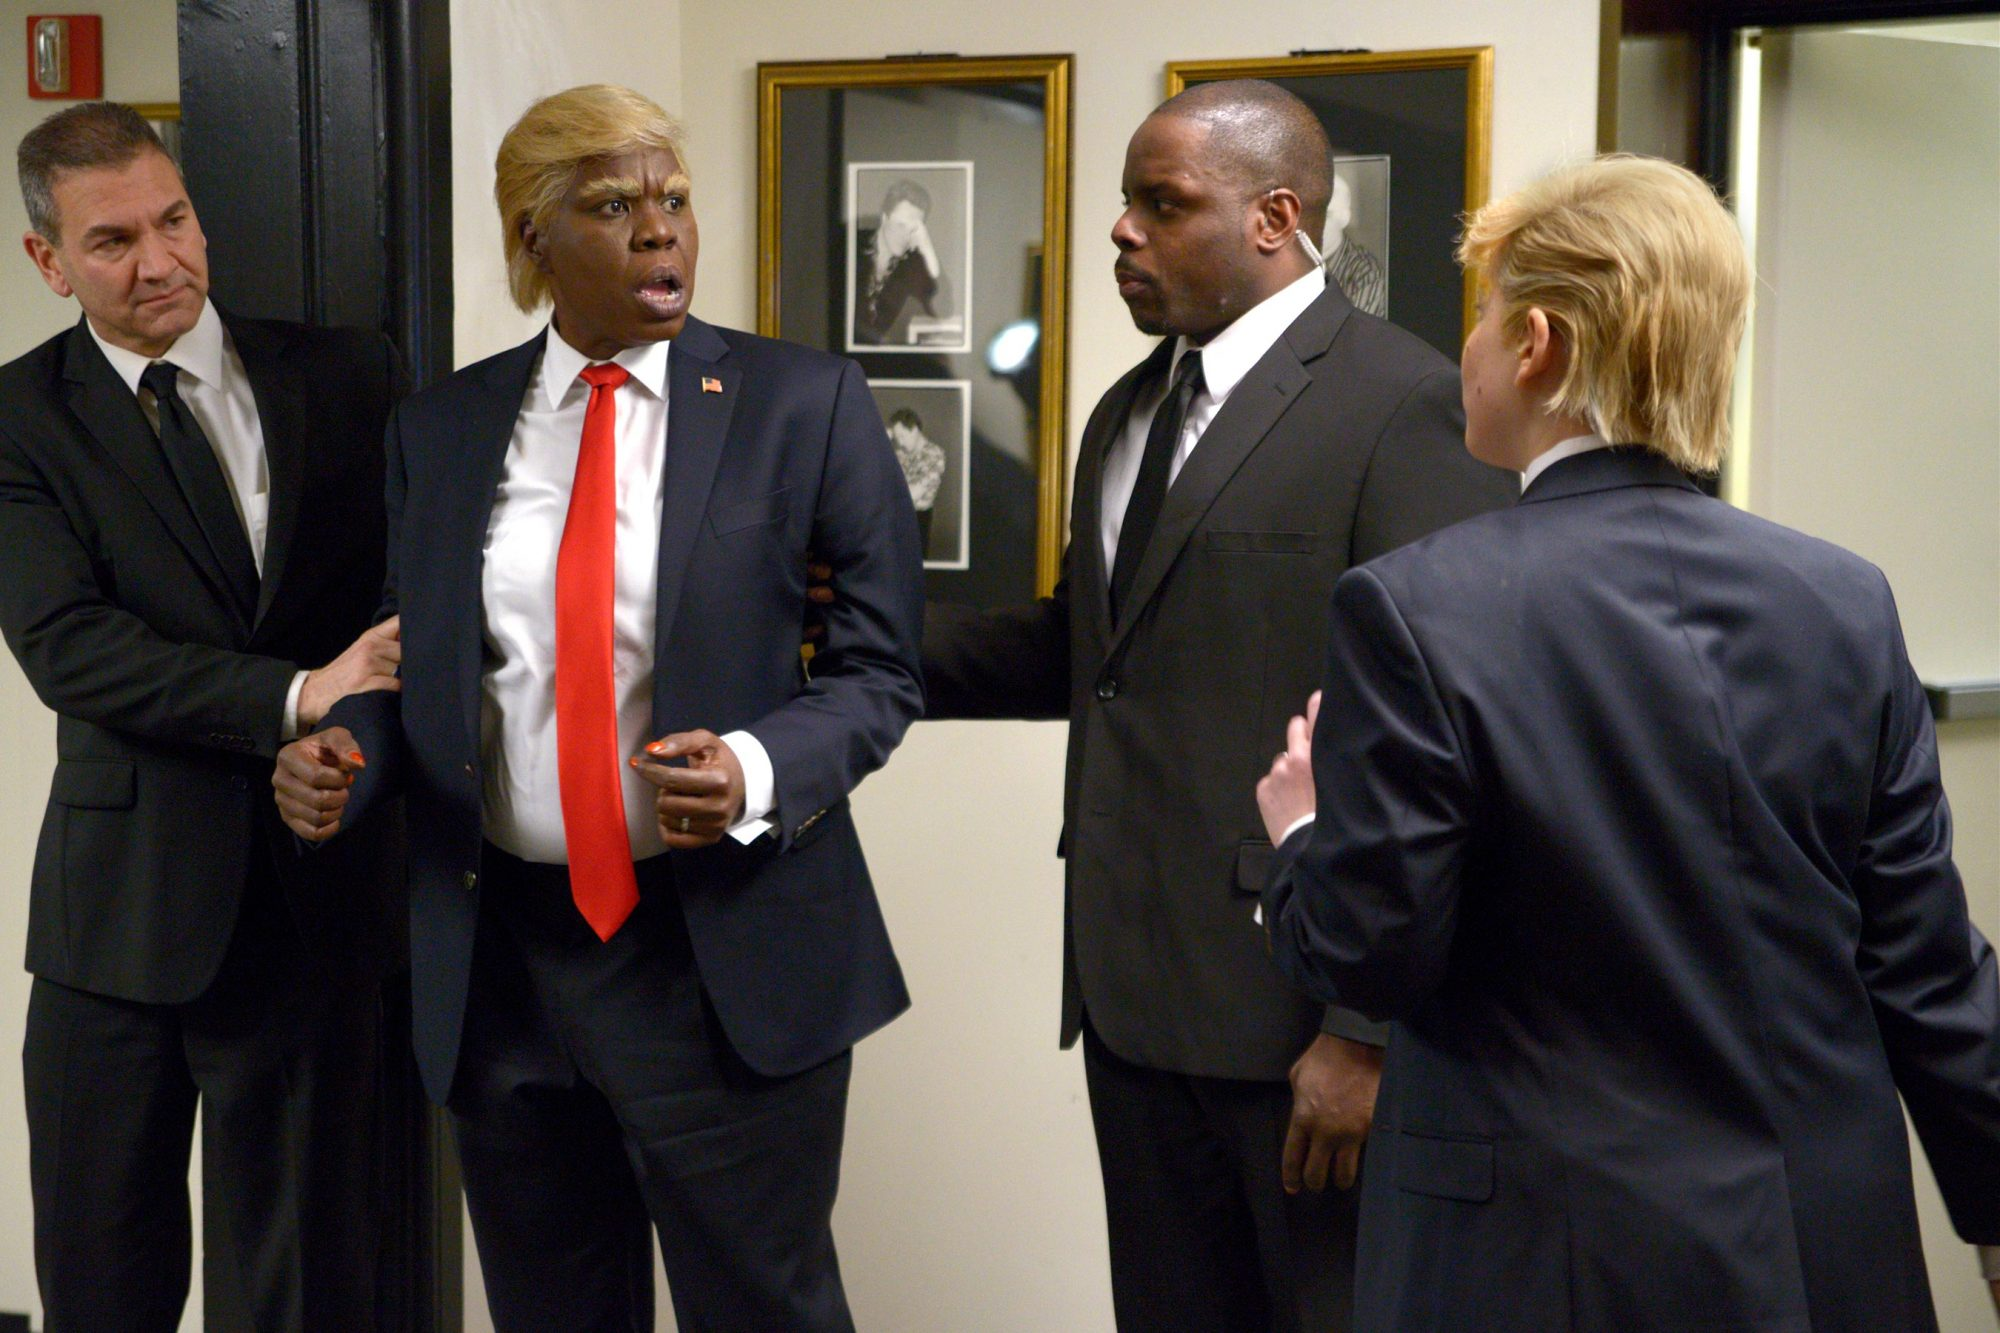 SATURDAY NIGHT LIVE Leslie Jones as Donald Trump